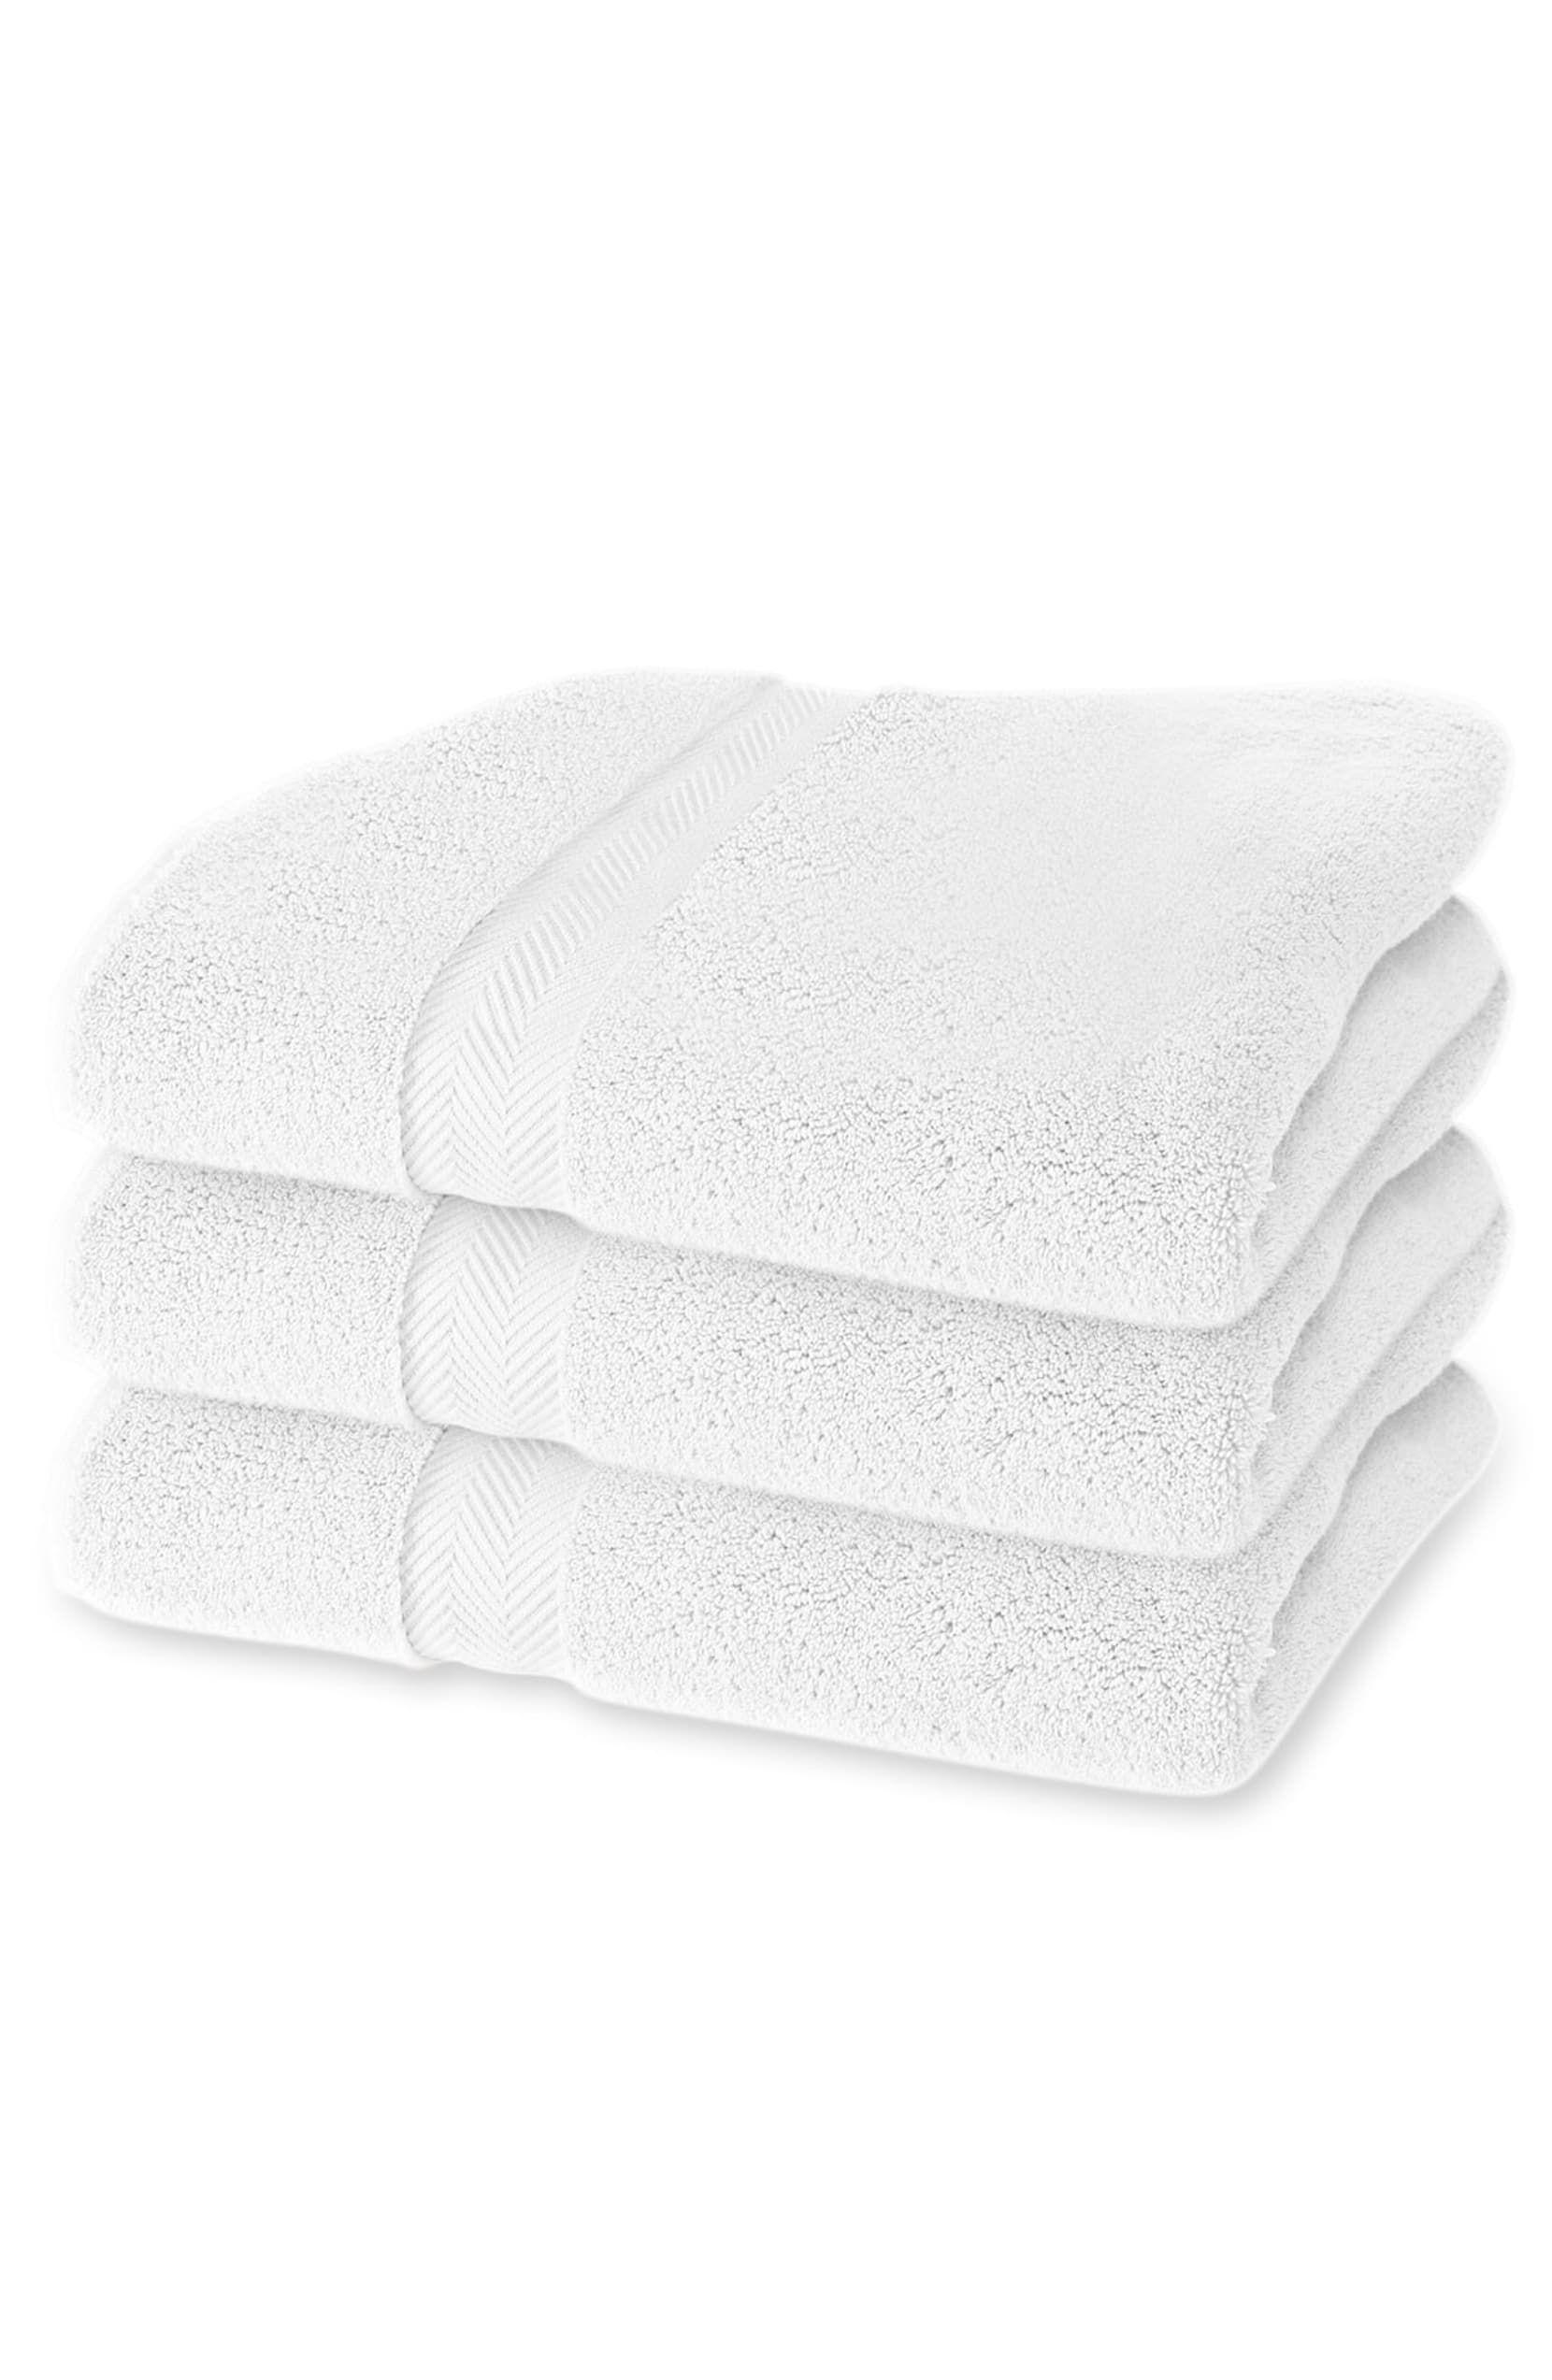 Hydrocotton Bath Towel Nordstrom In 2020 Bath Towels Towel Washing Clothes